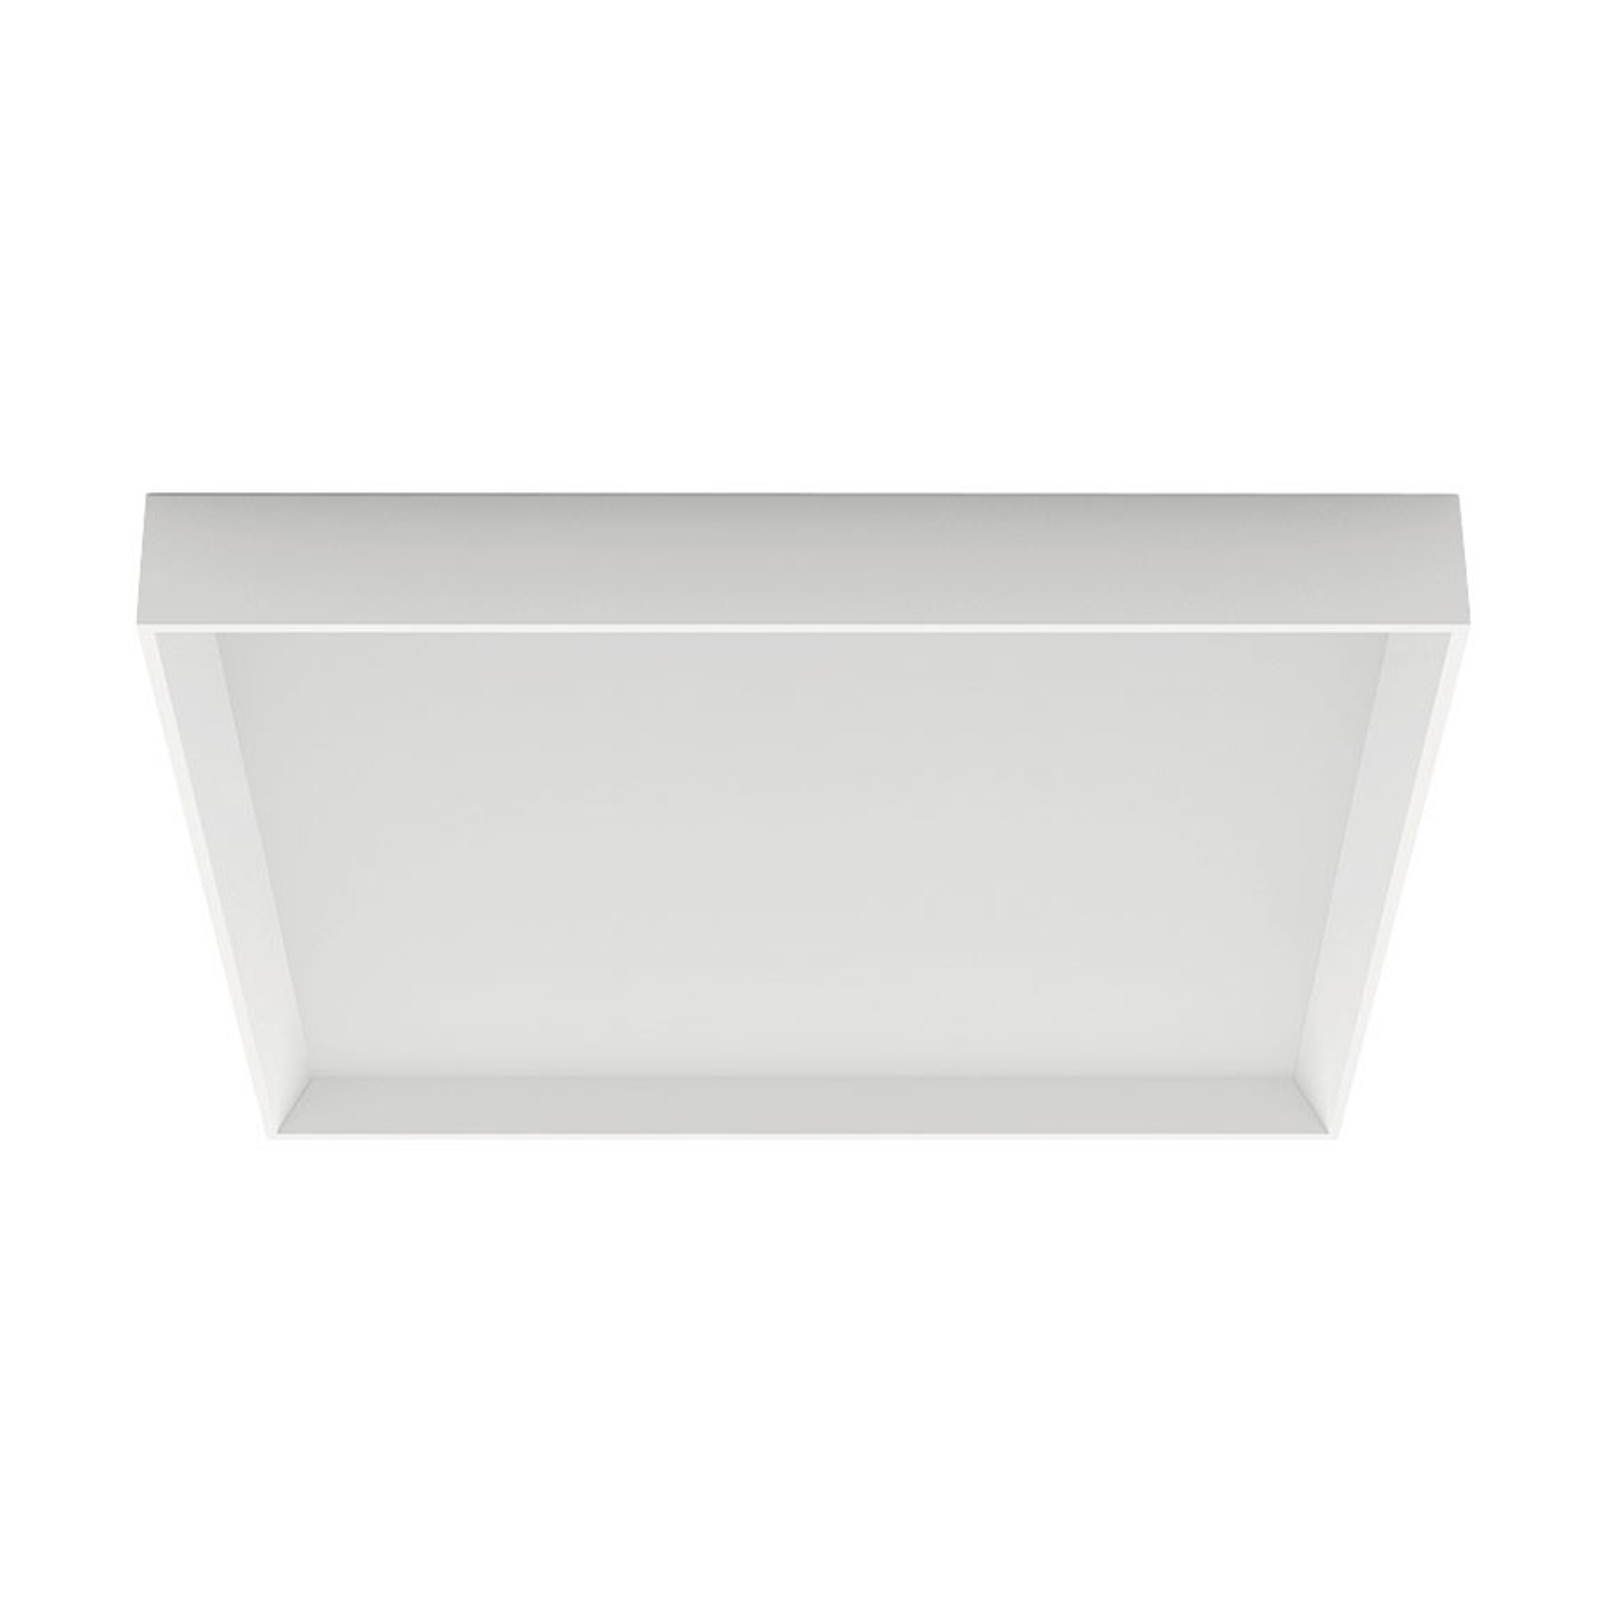 Lampa sufitowa LED Tara Q, kątowa, 50 x 50 cm